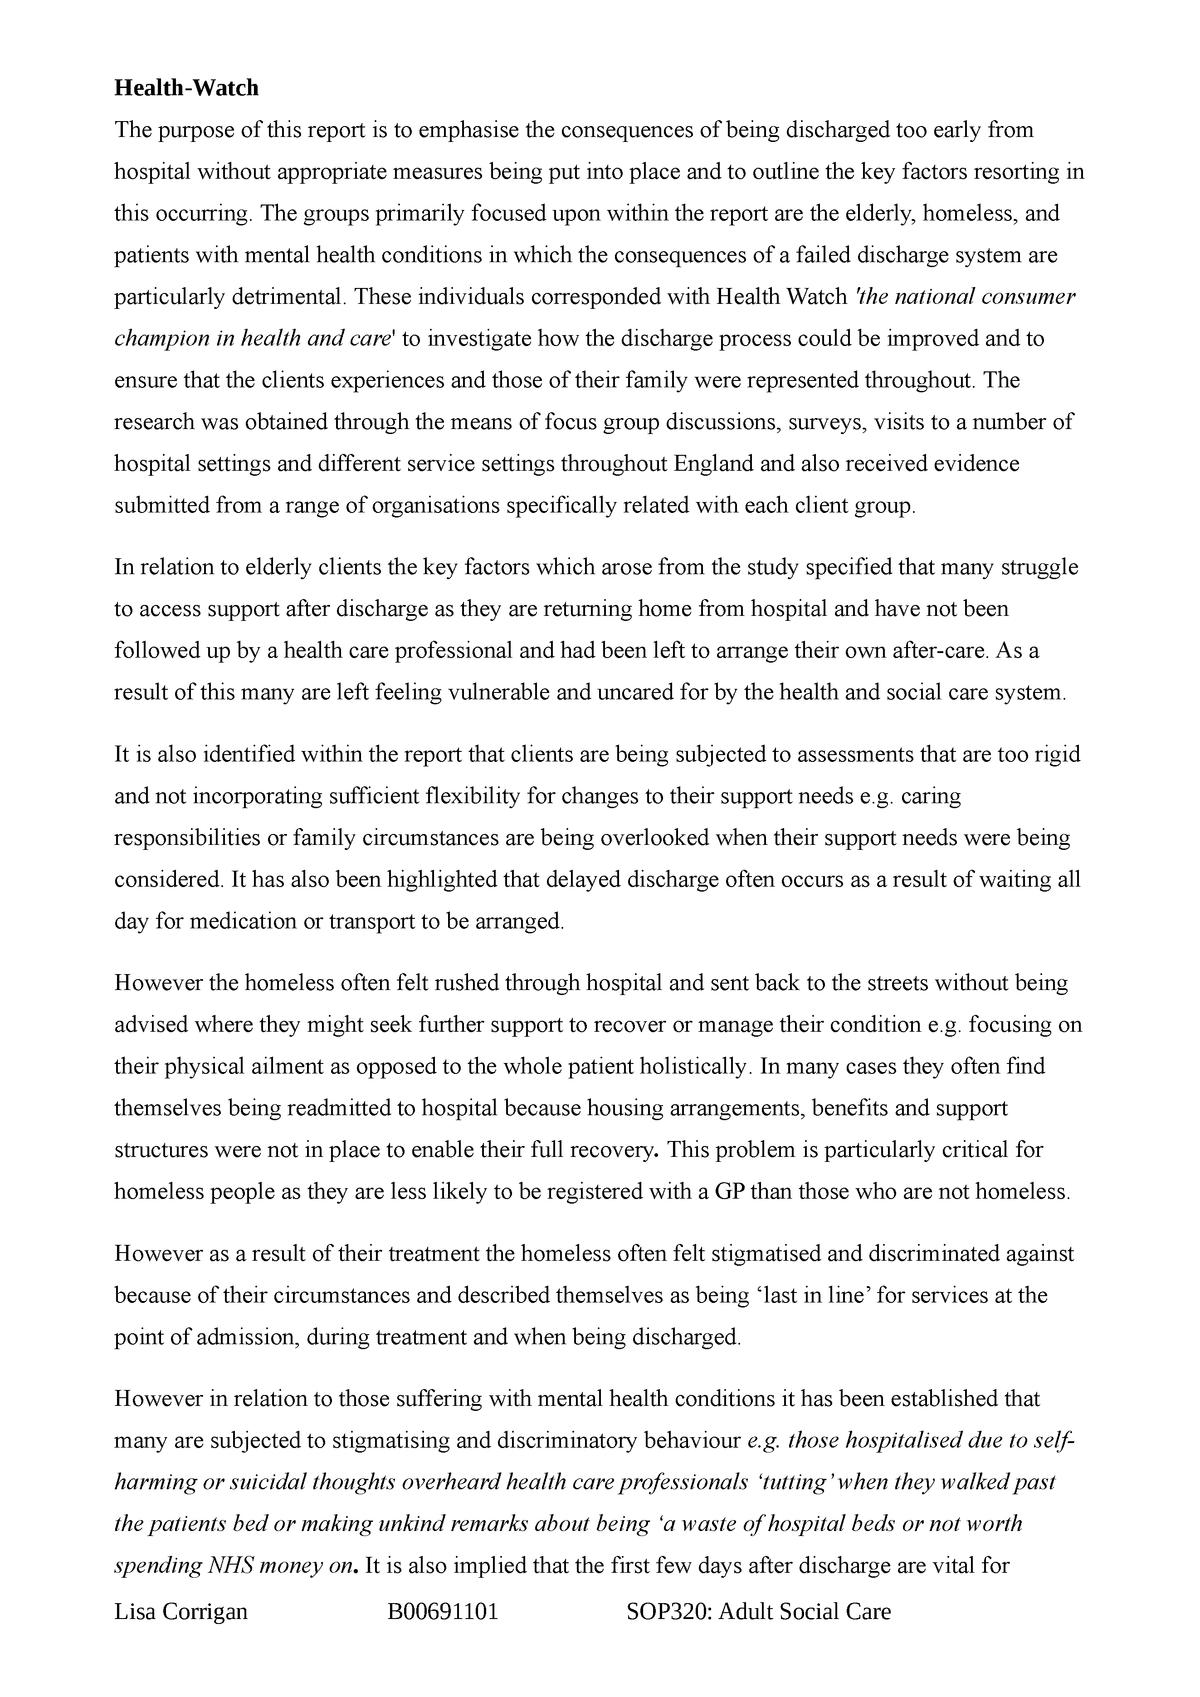 Assignment 2 health watch - SOP320: Adult Social Care - StuDocu